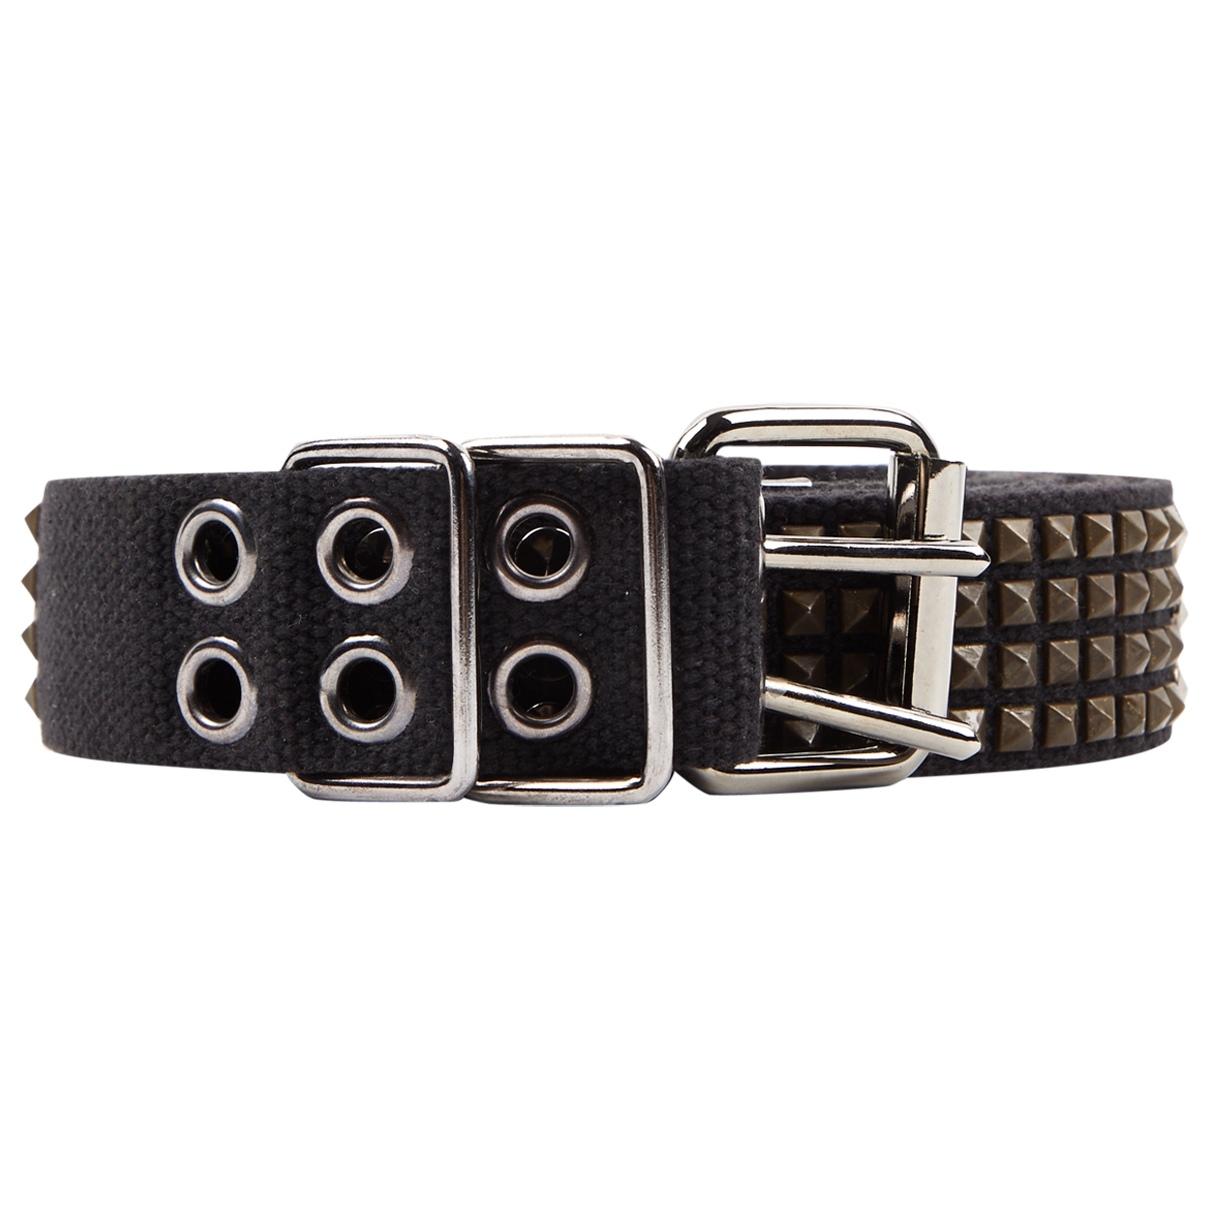 Balmain \N Black Cloth belt for Women XS International